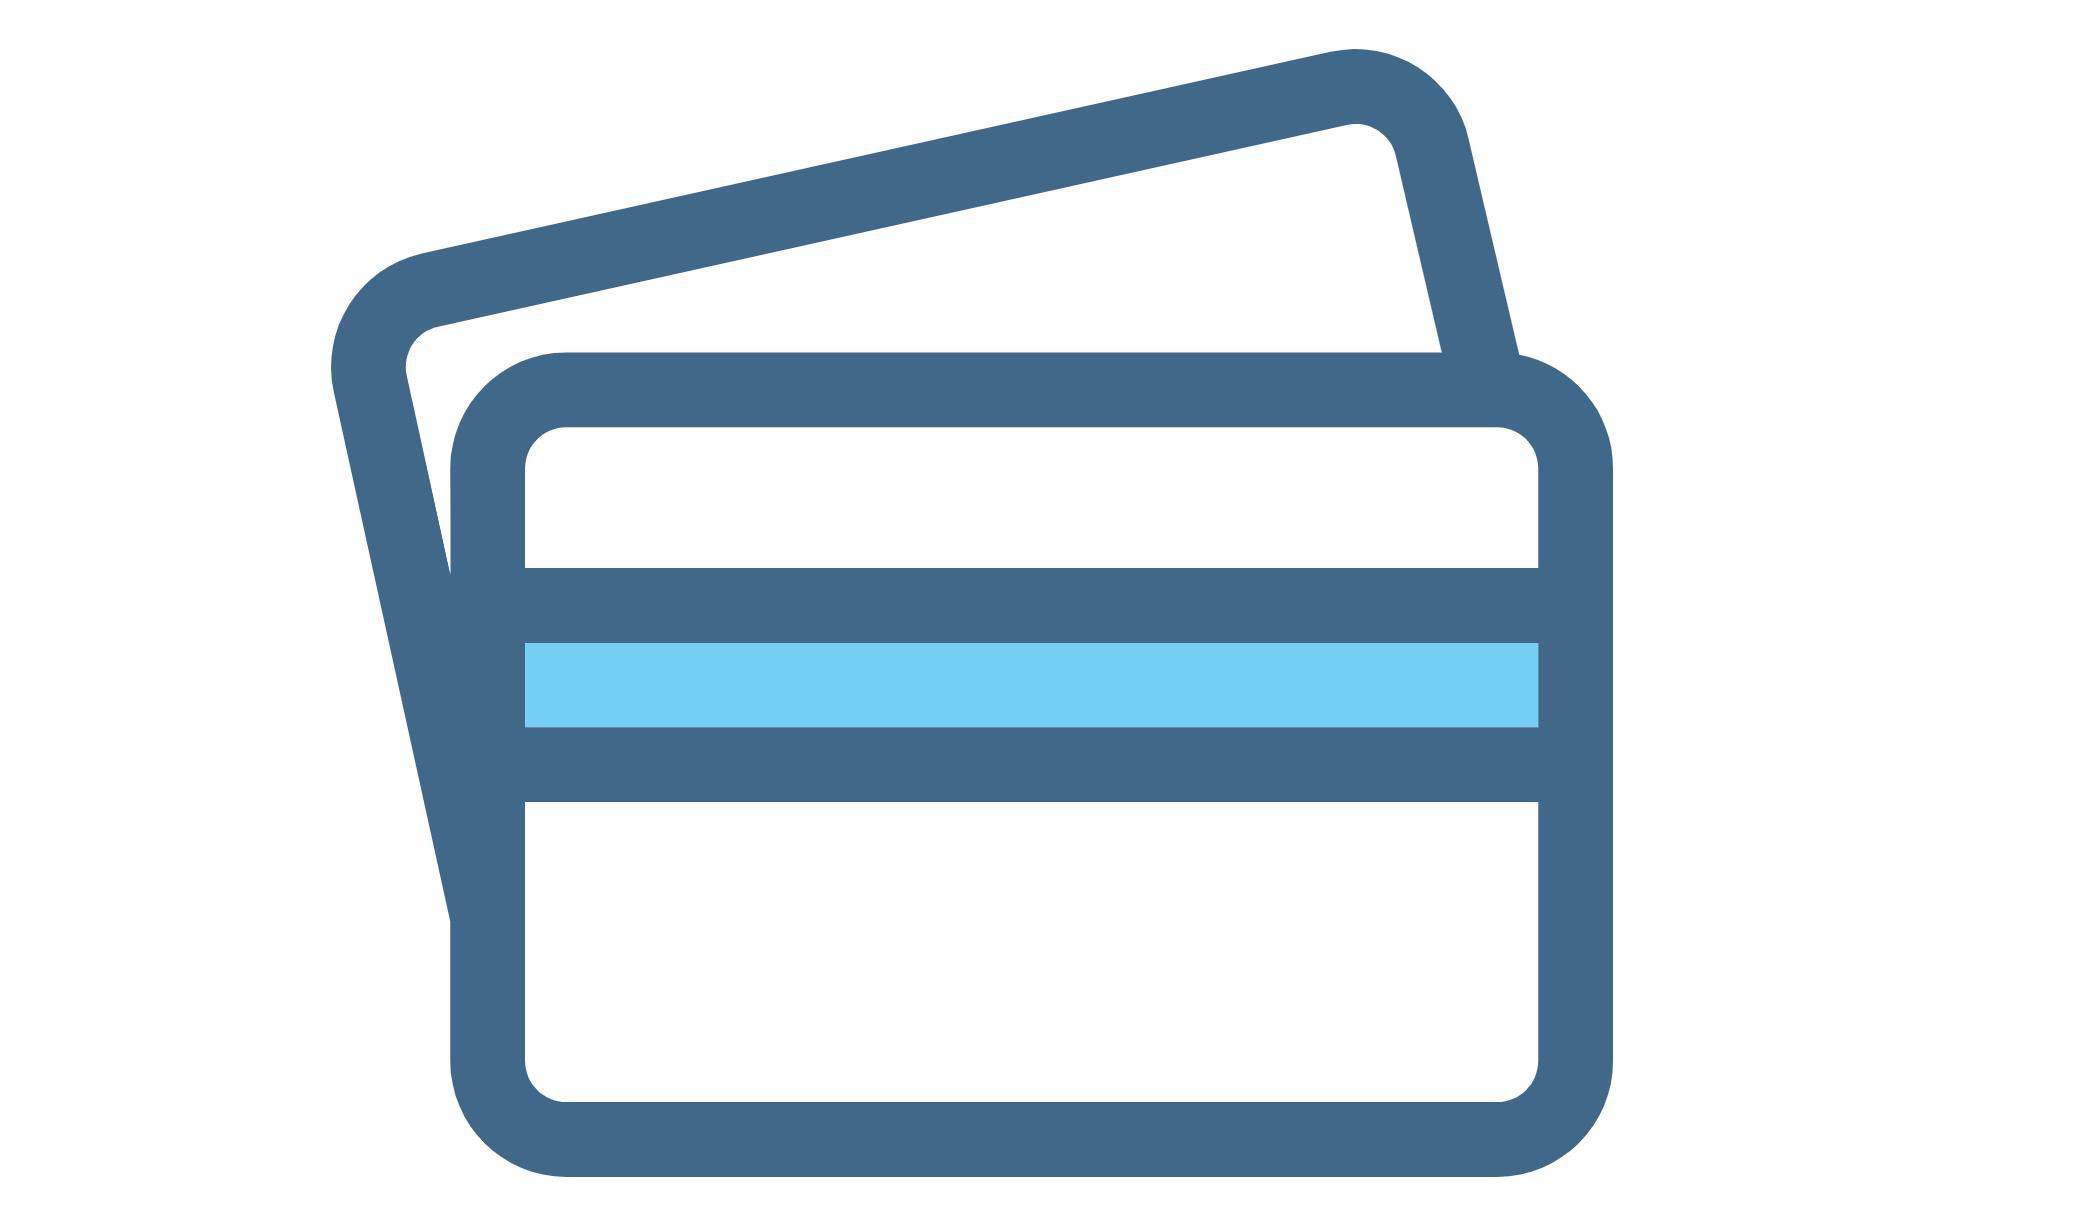 www.capitalone.com/securedcard/deposit